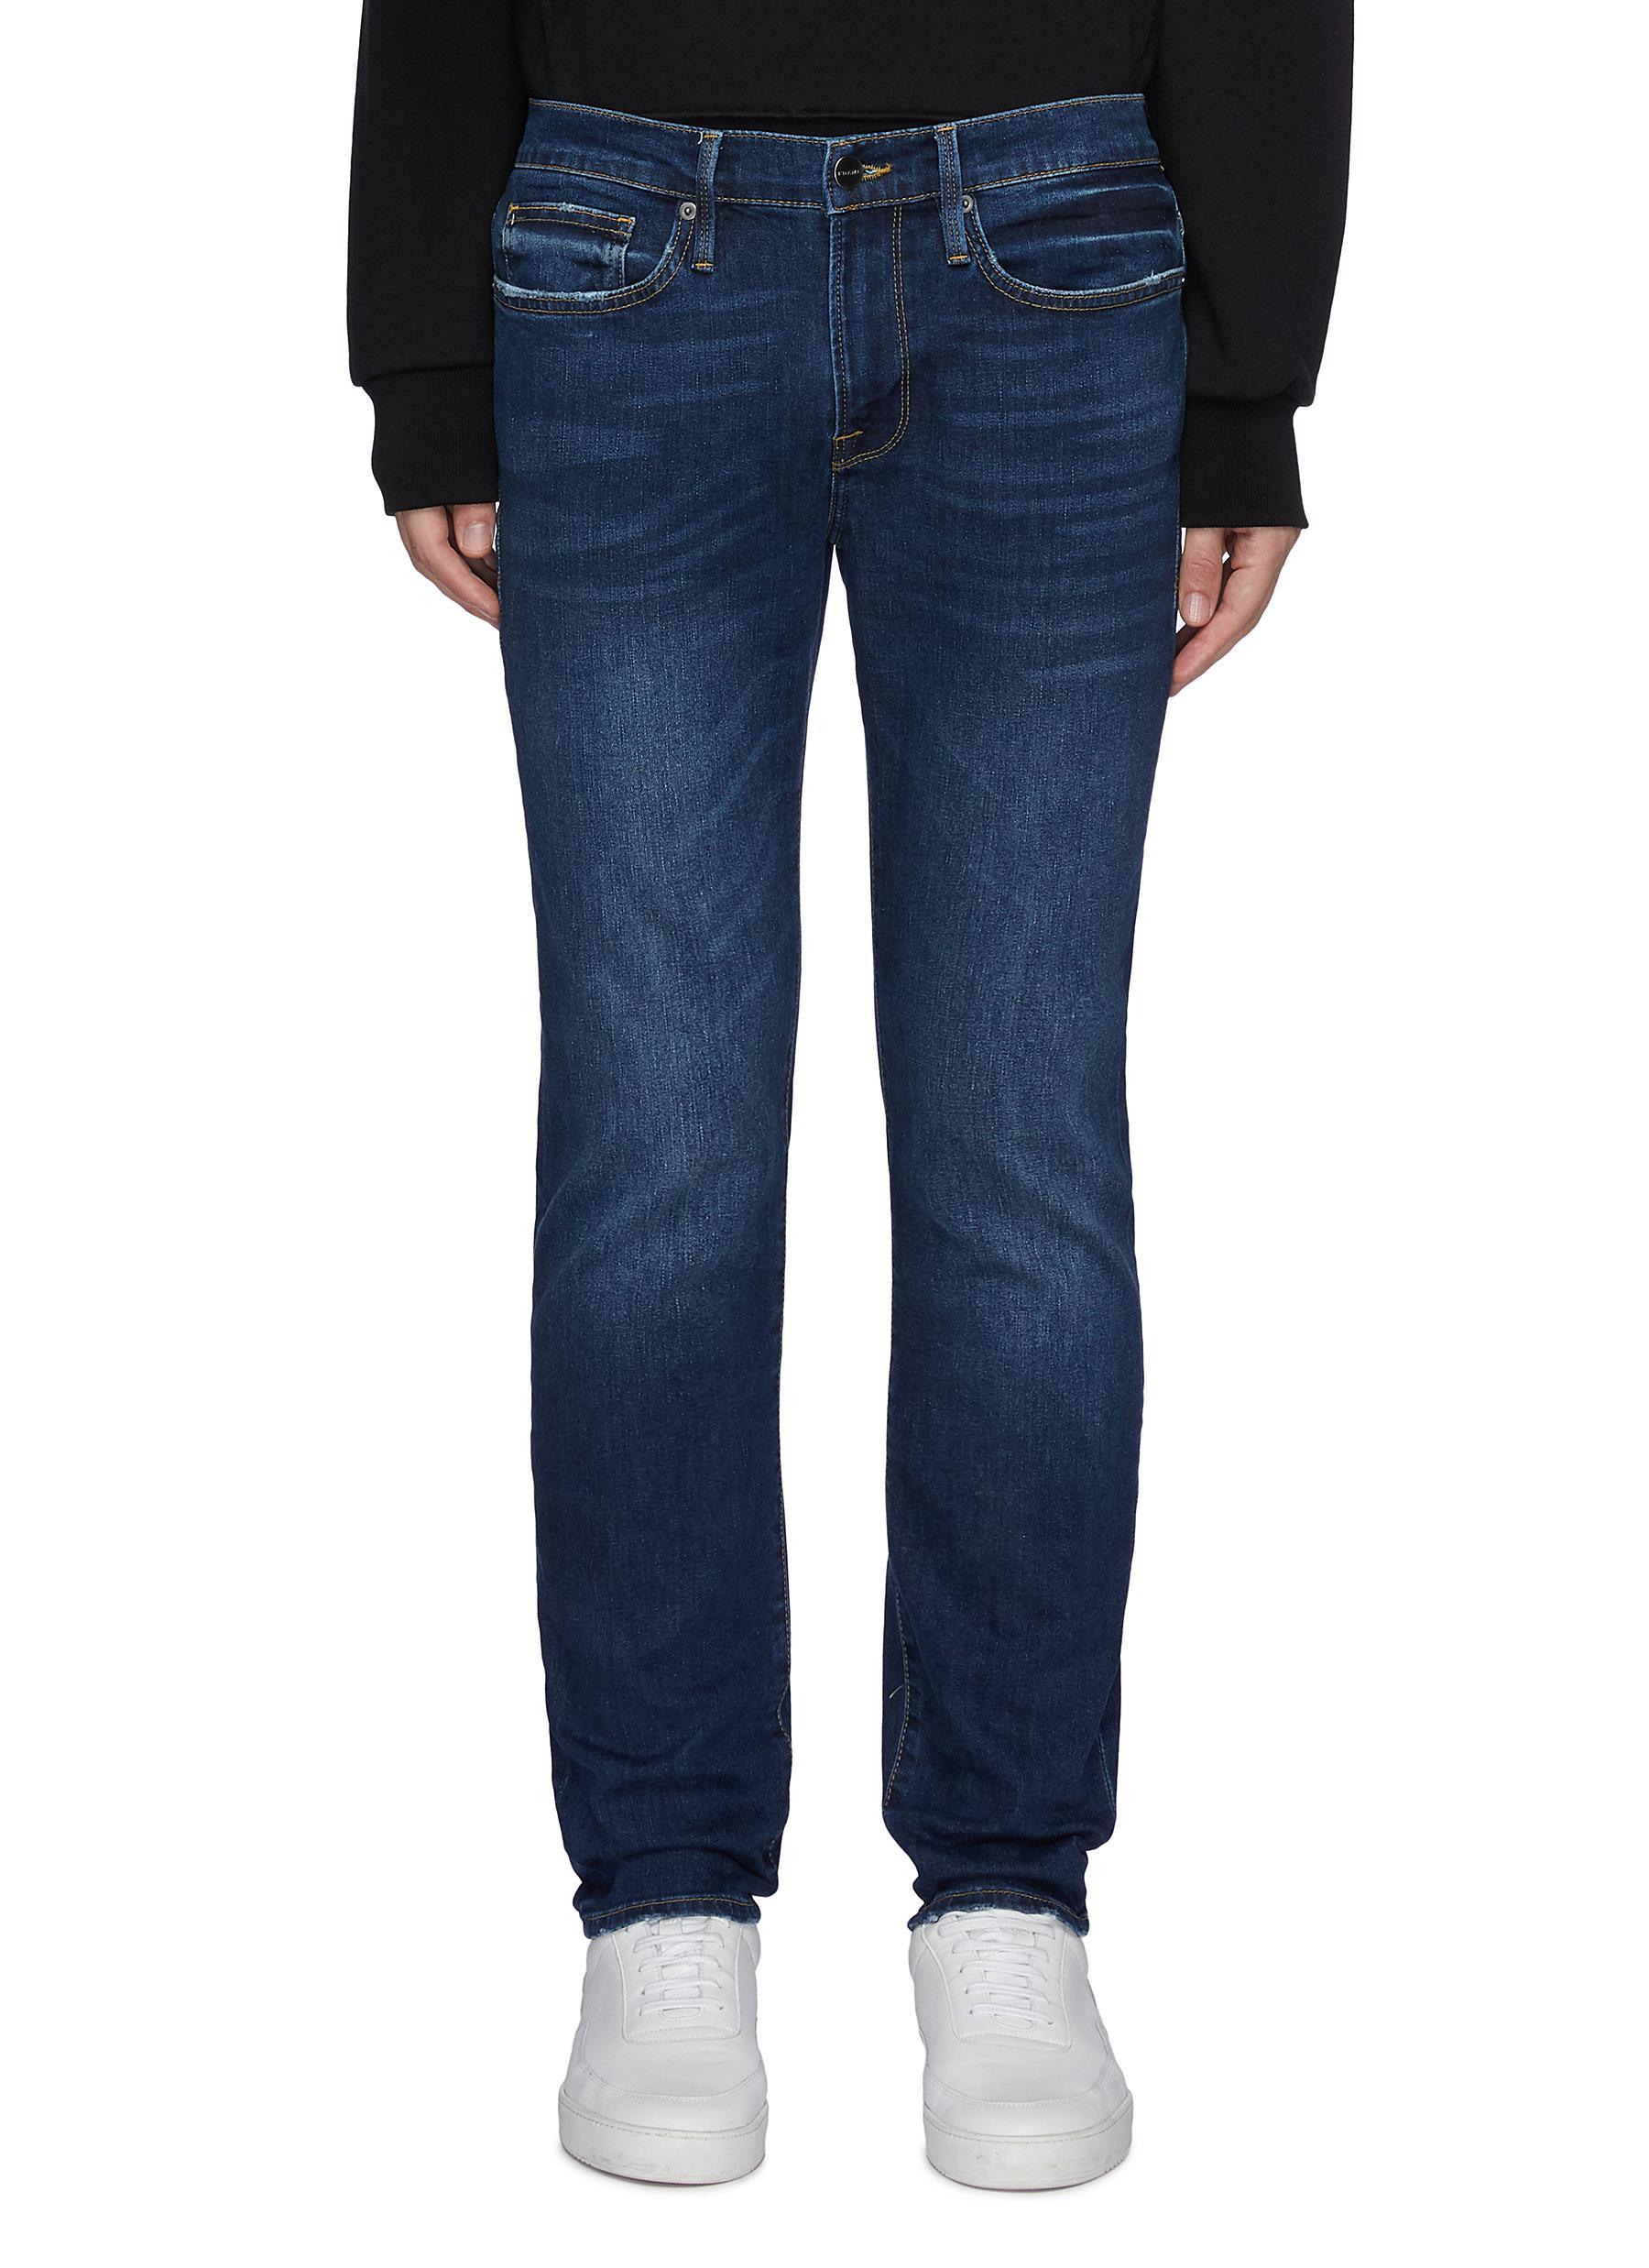 Whiskering Details Purify L'Homme Dark Wash Skinny Jean